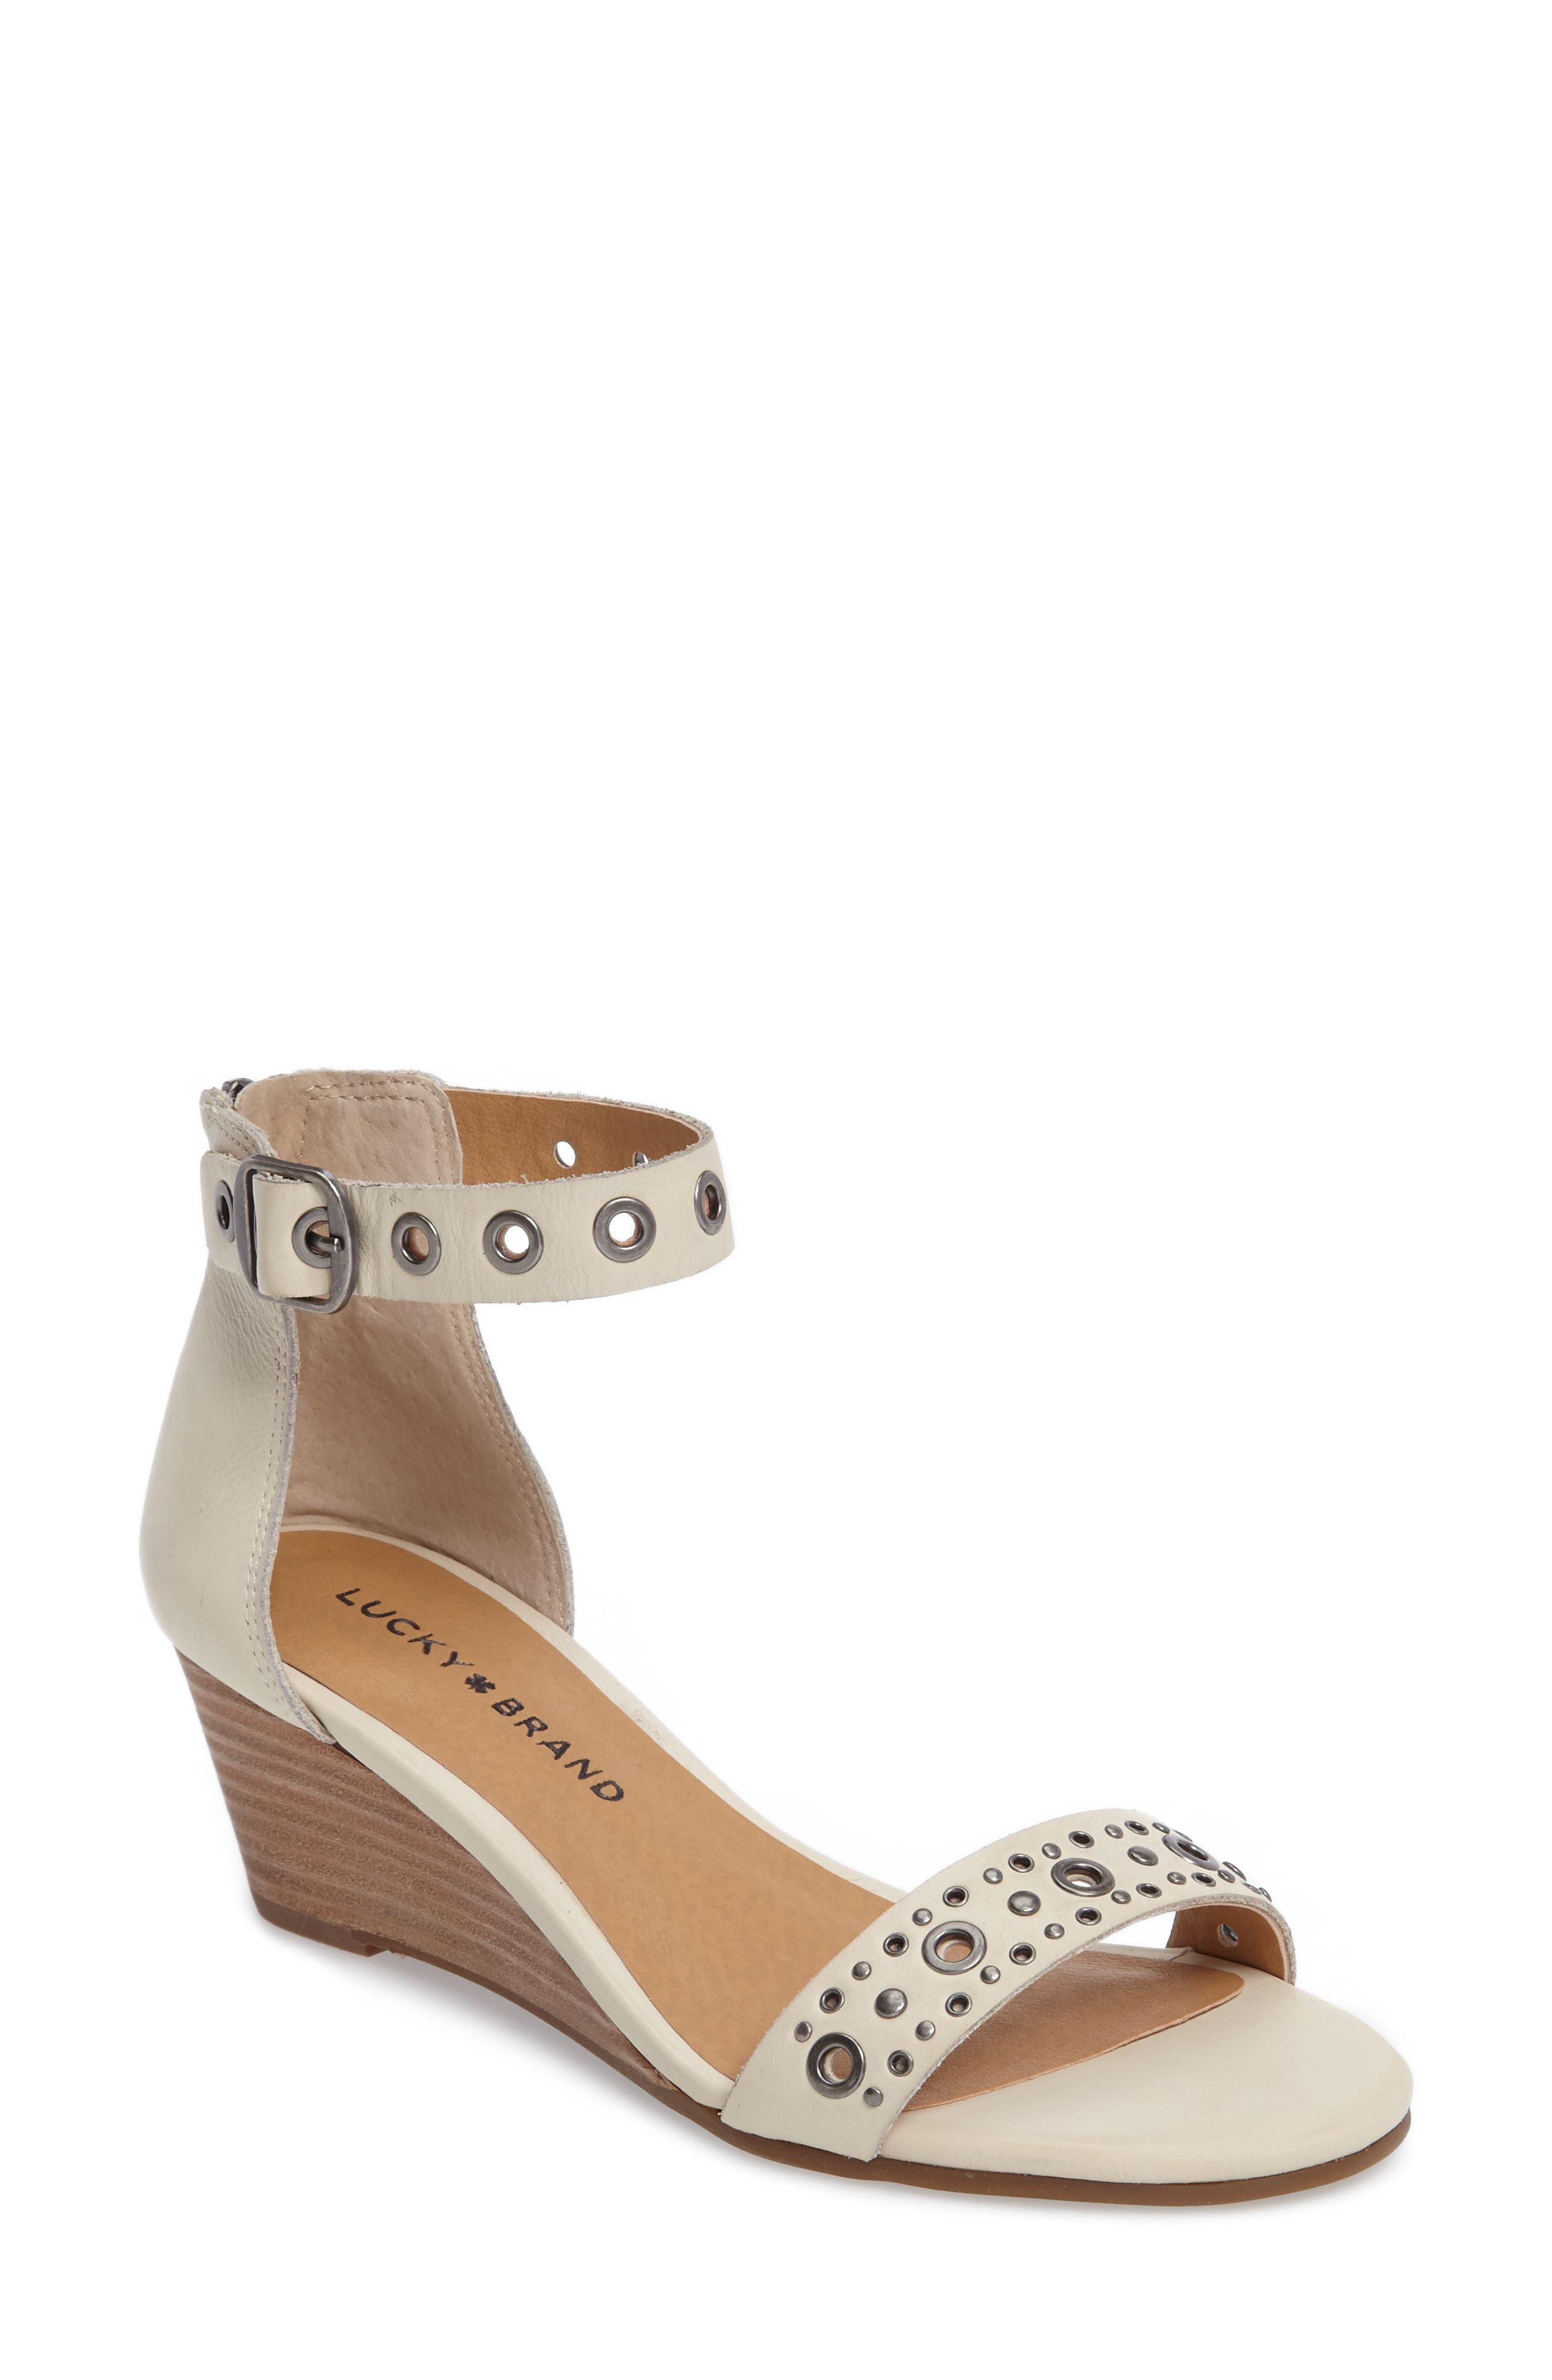 Main Image - Lucky Brand Jorey Ankle Strap Wedge Sandal (Women)